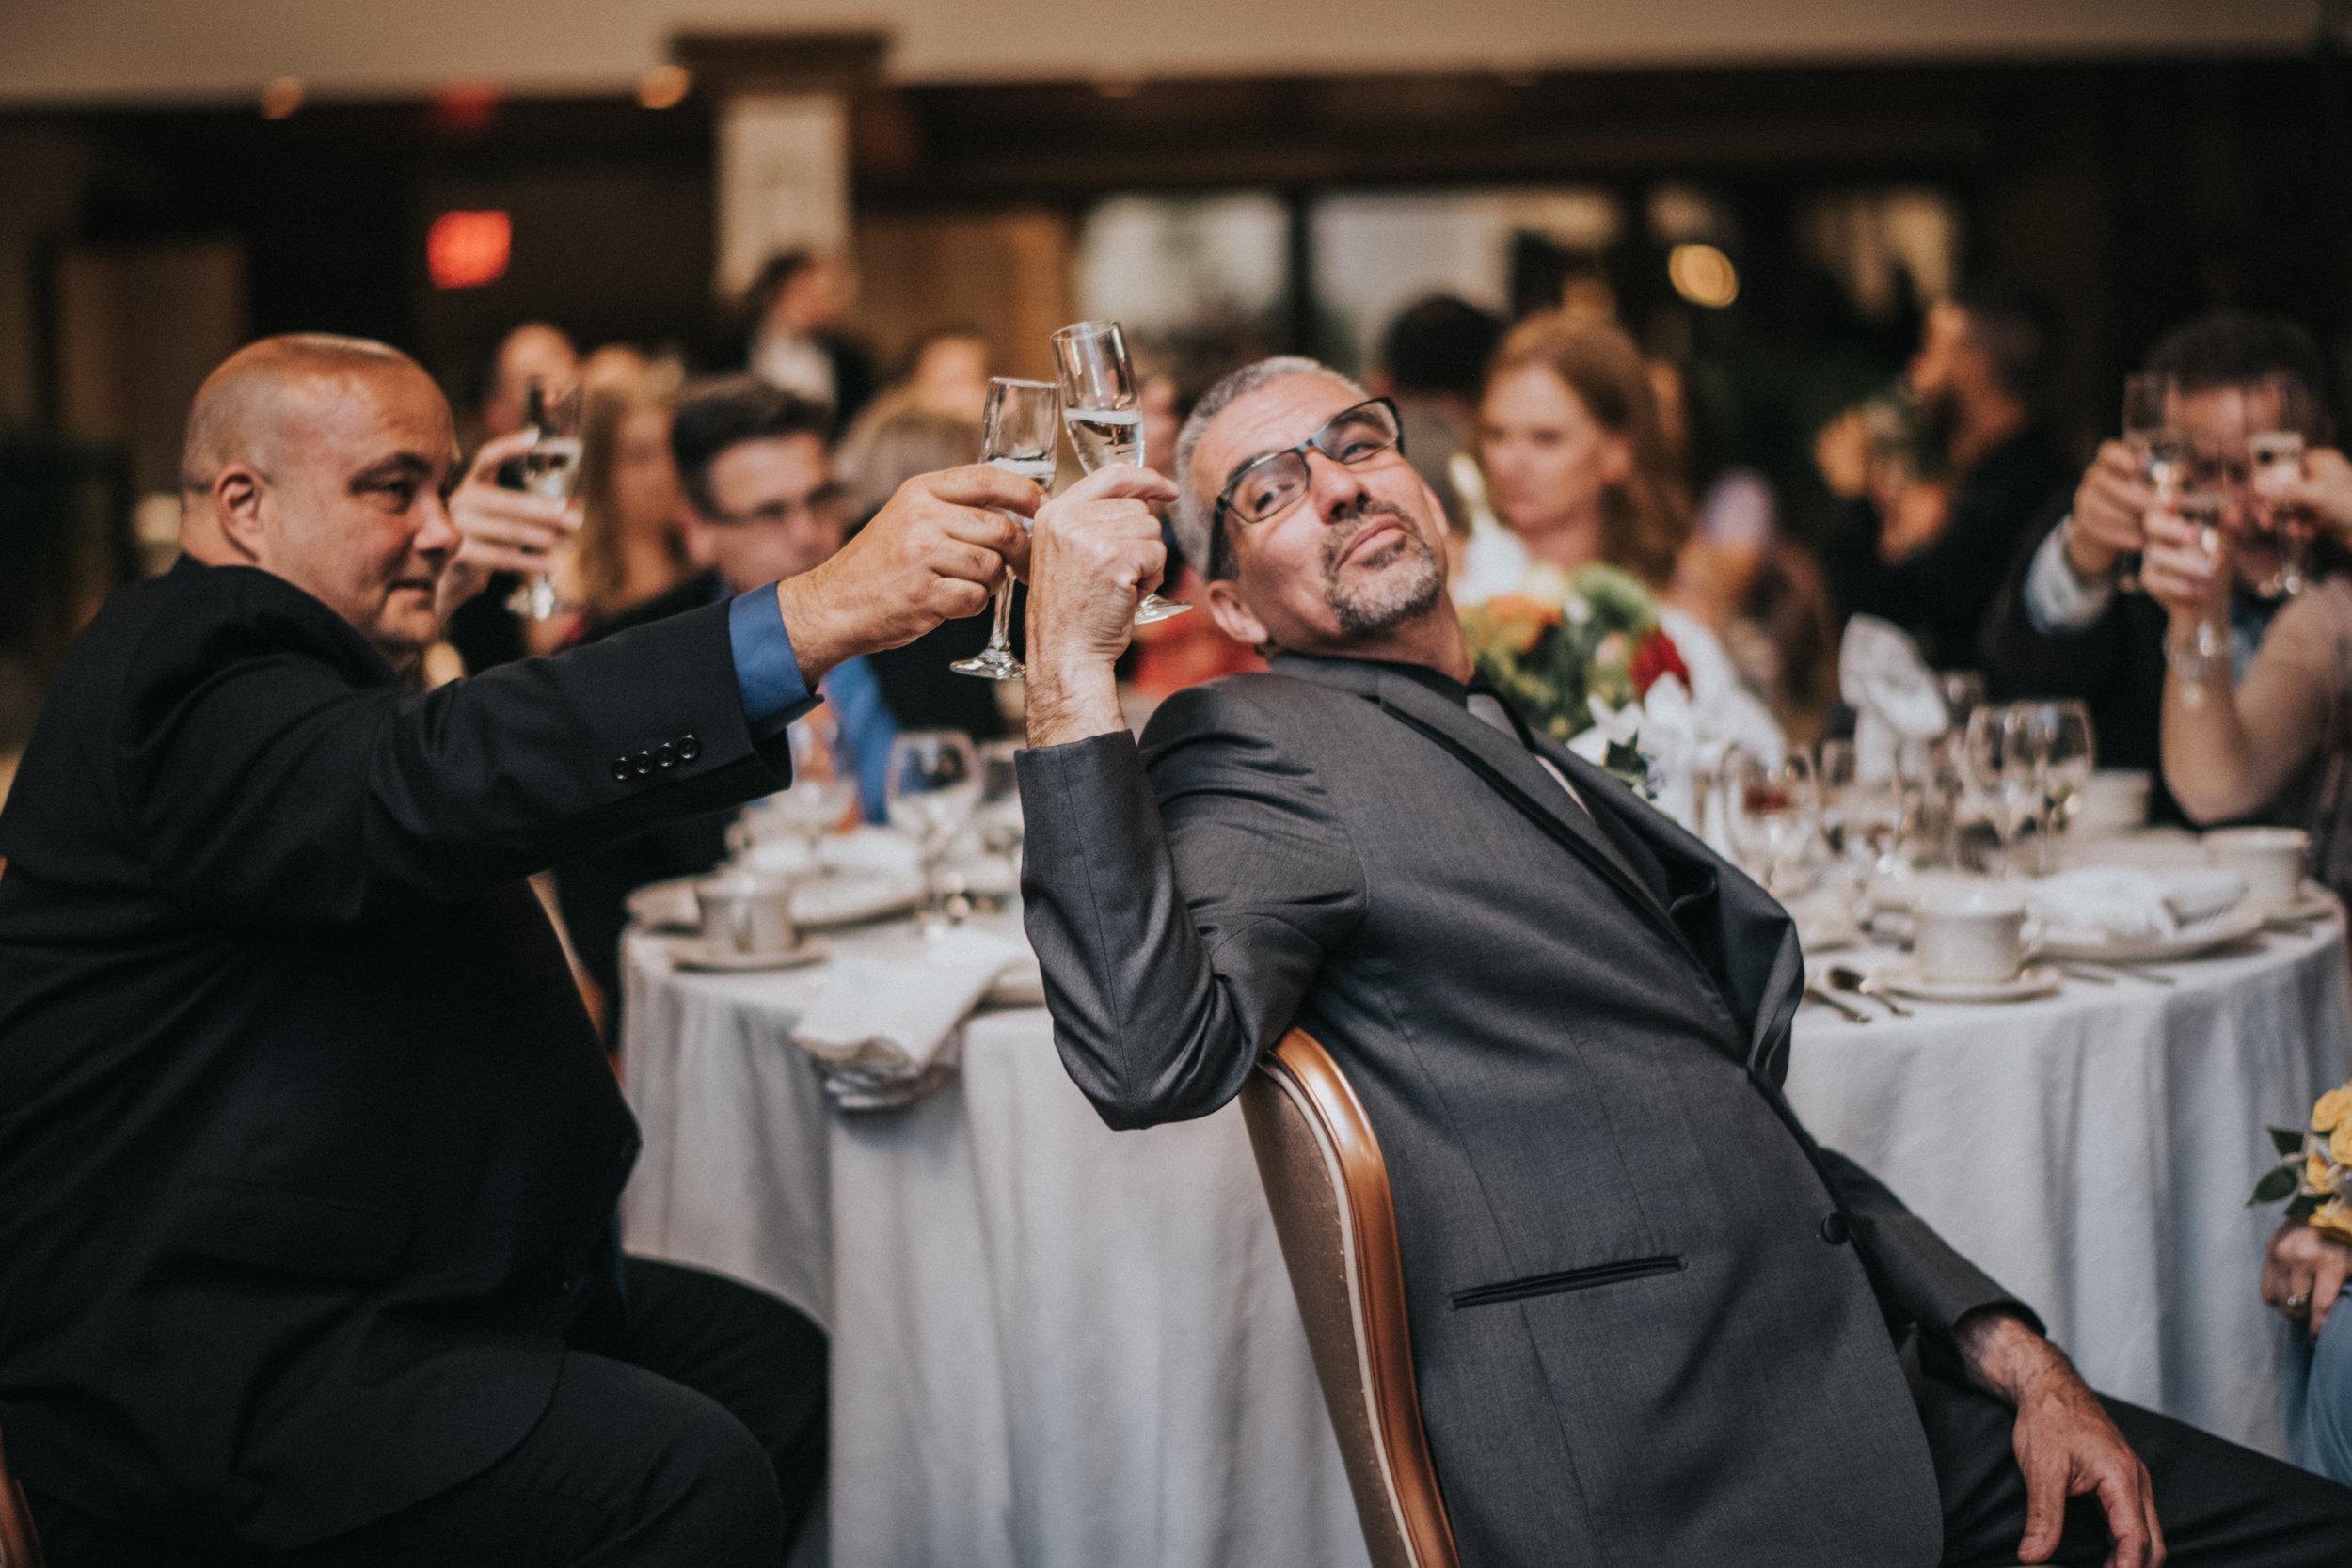 New-Jersey-Wedding-Photographer-Megan&Nick-Reception-91.jpg